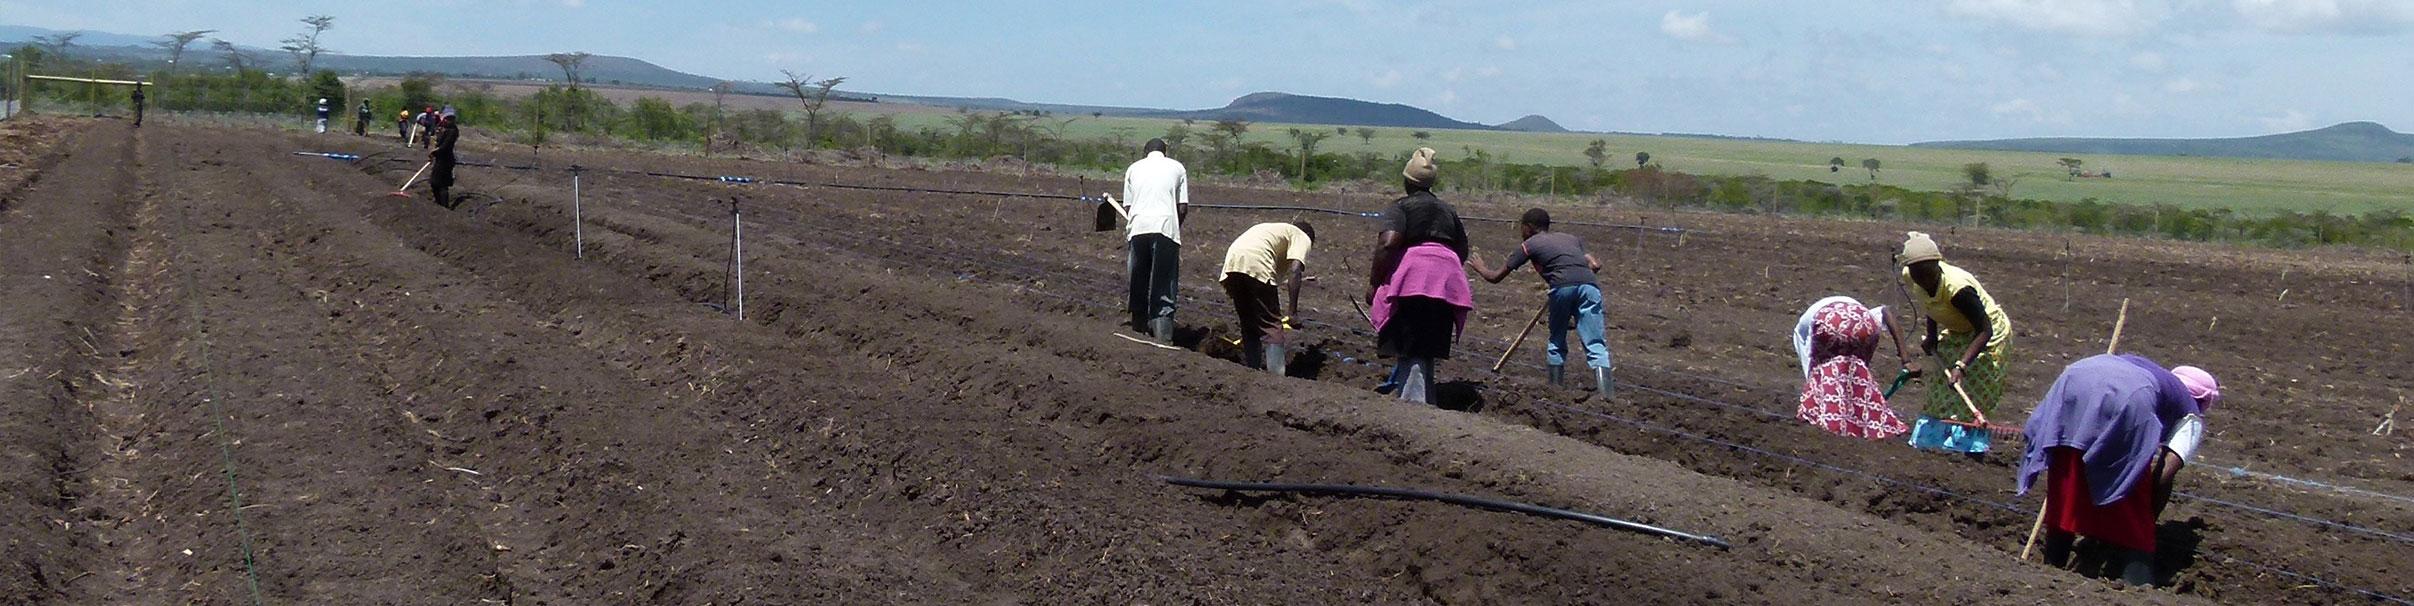 women working field banner image